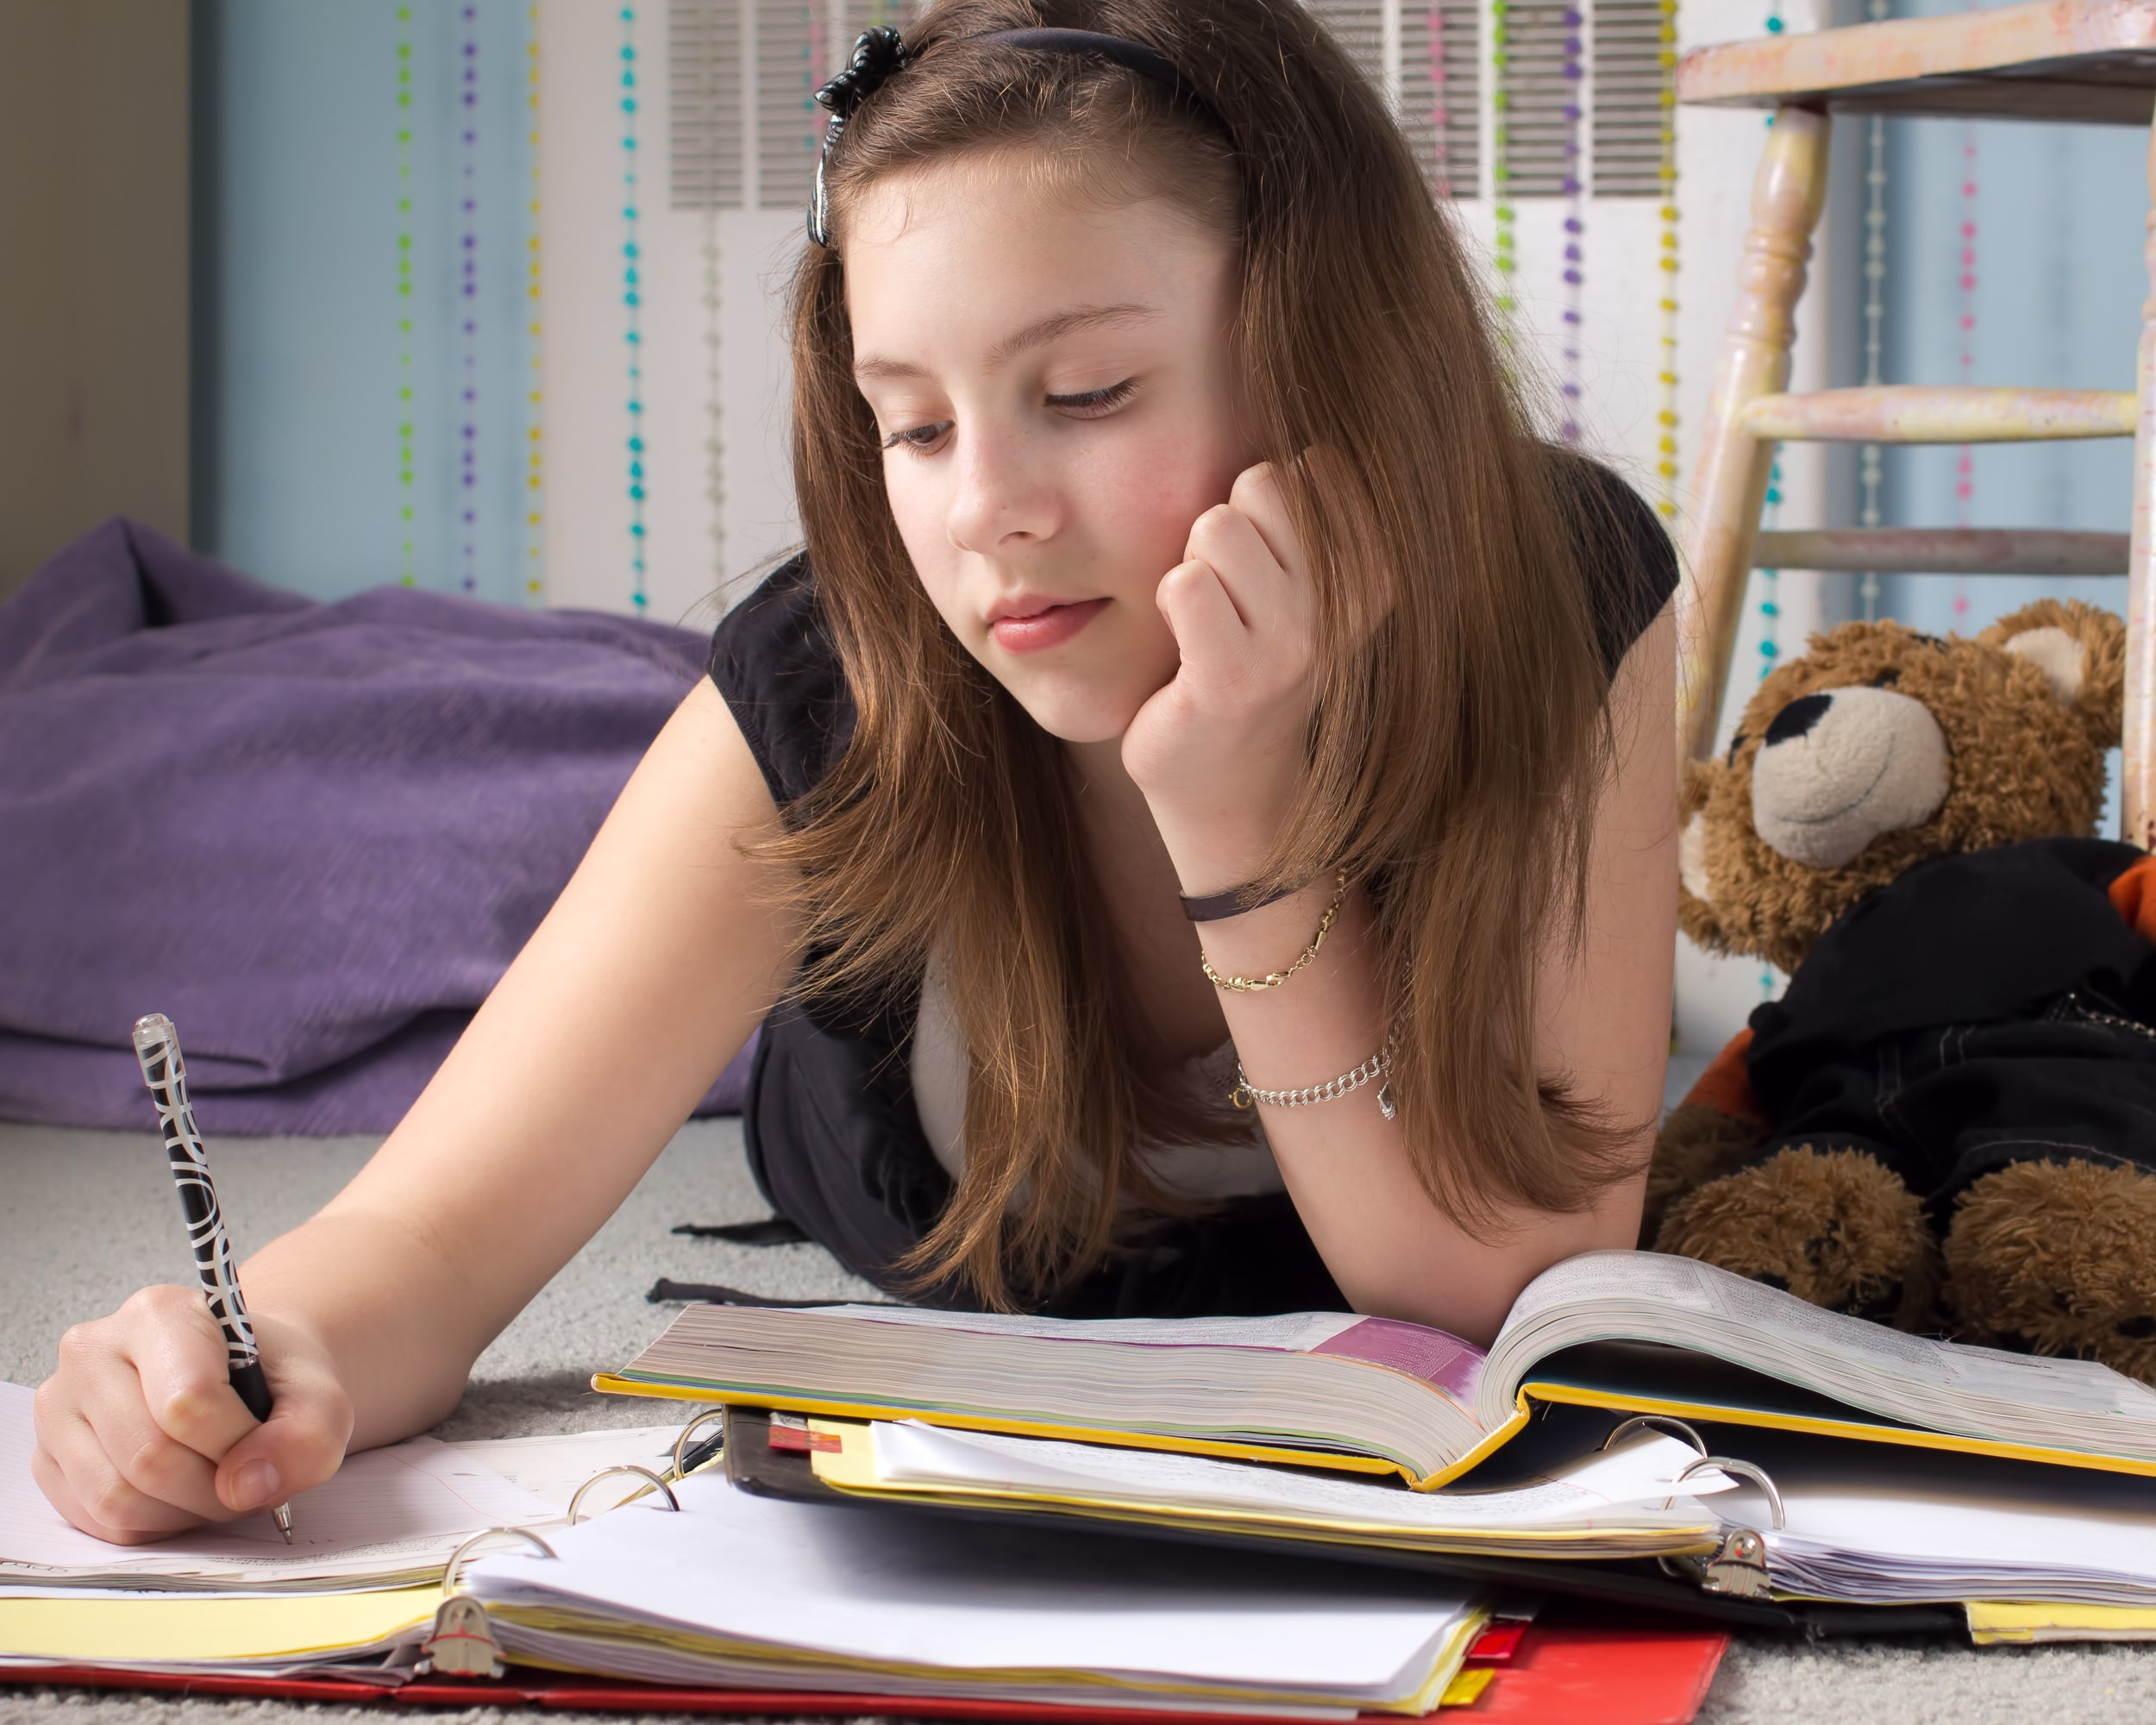 Do teenagers like doing homework